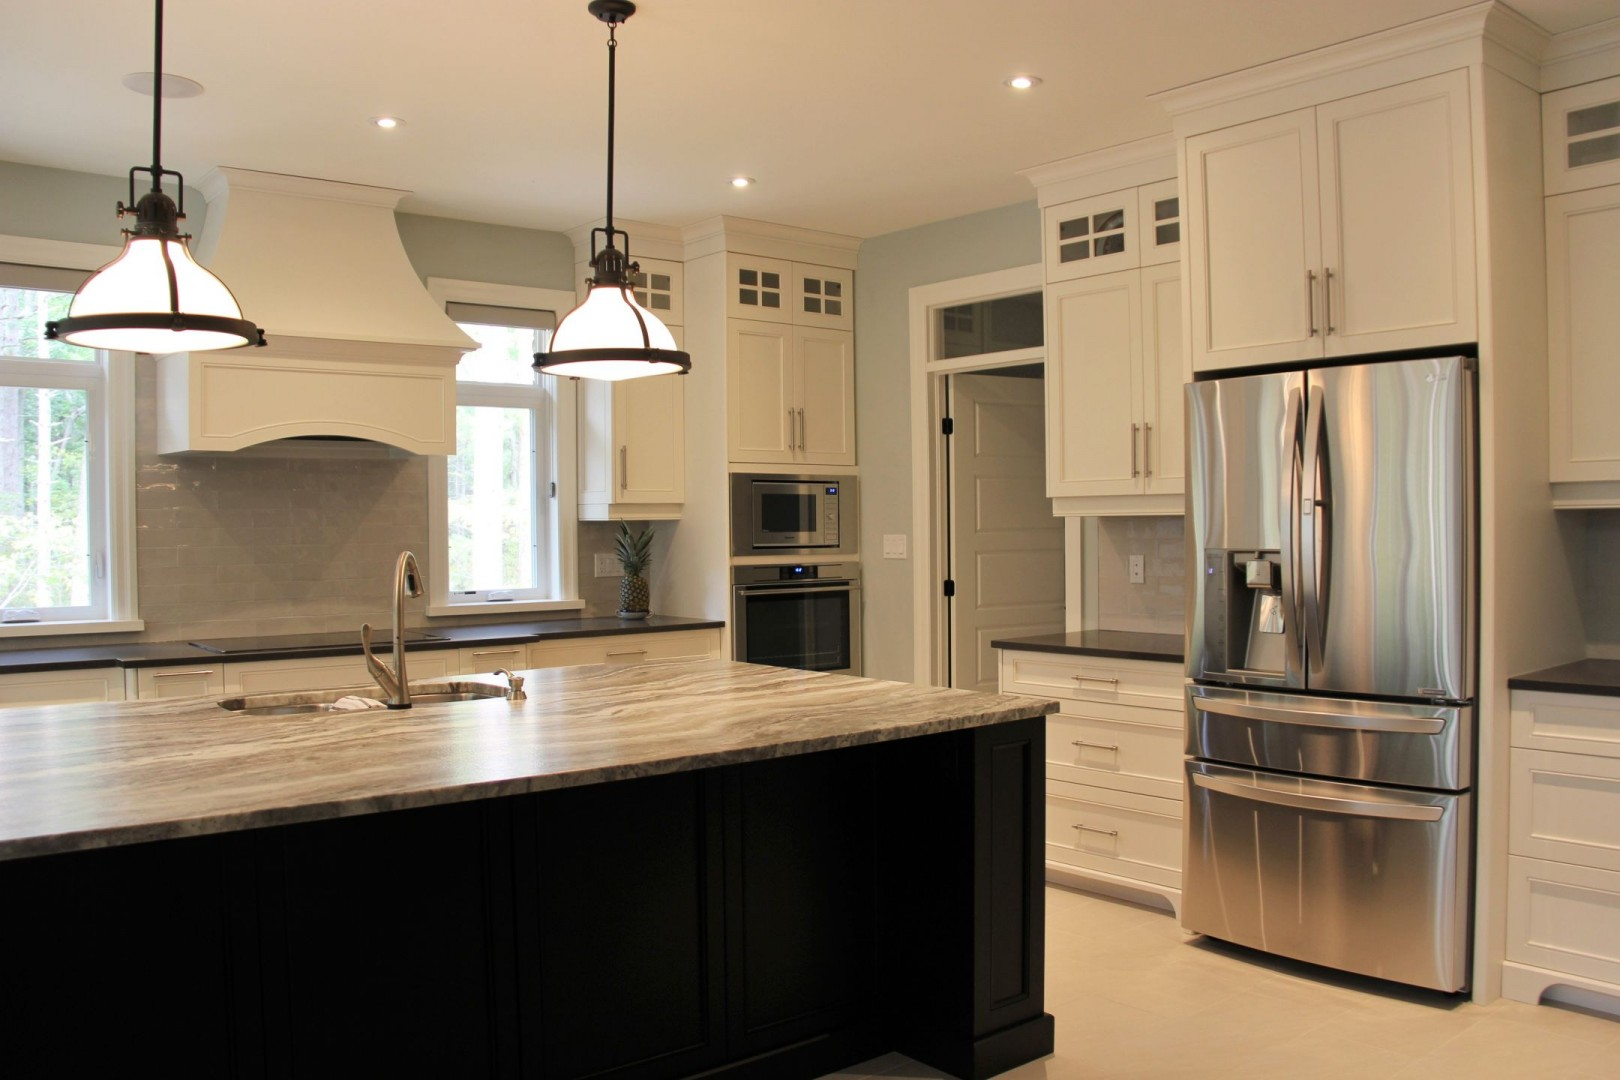 huron-woods-home-2015_kitchen_1